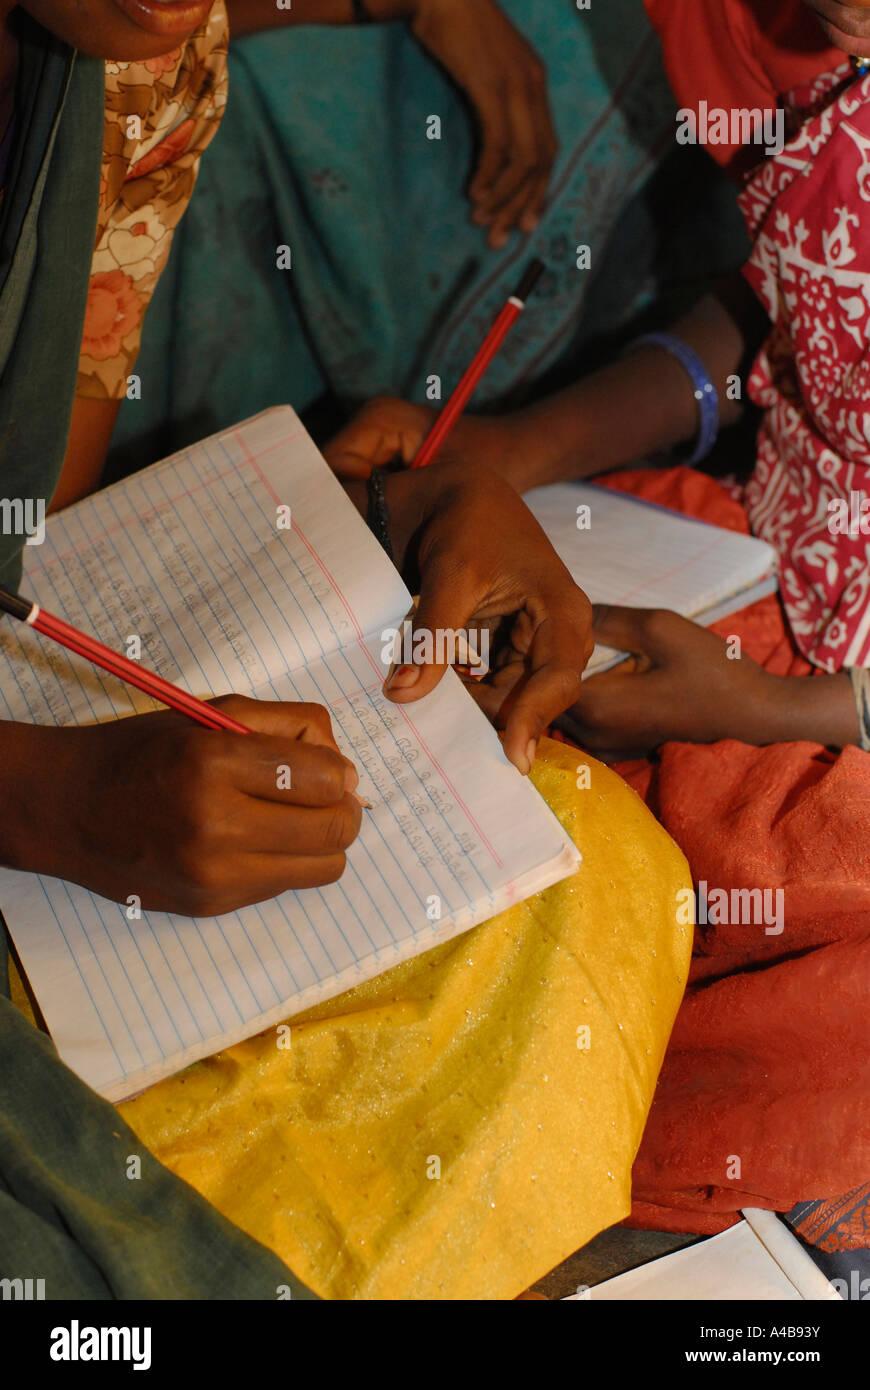 Singara chennai essay writer